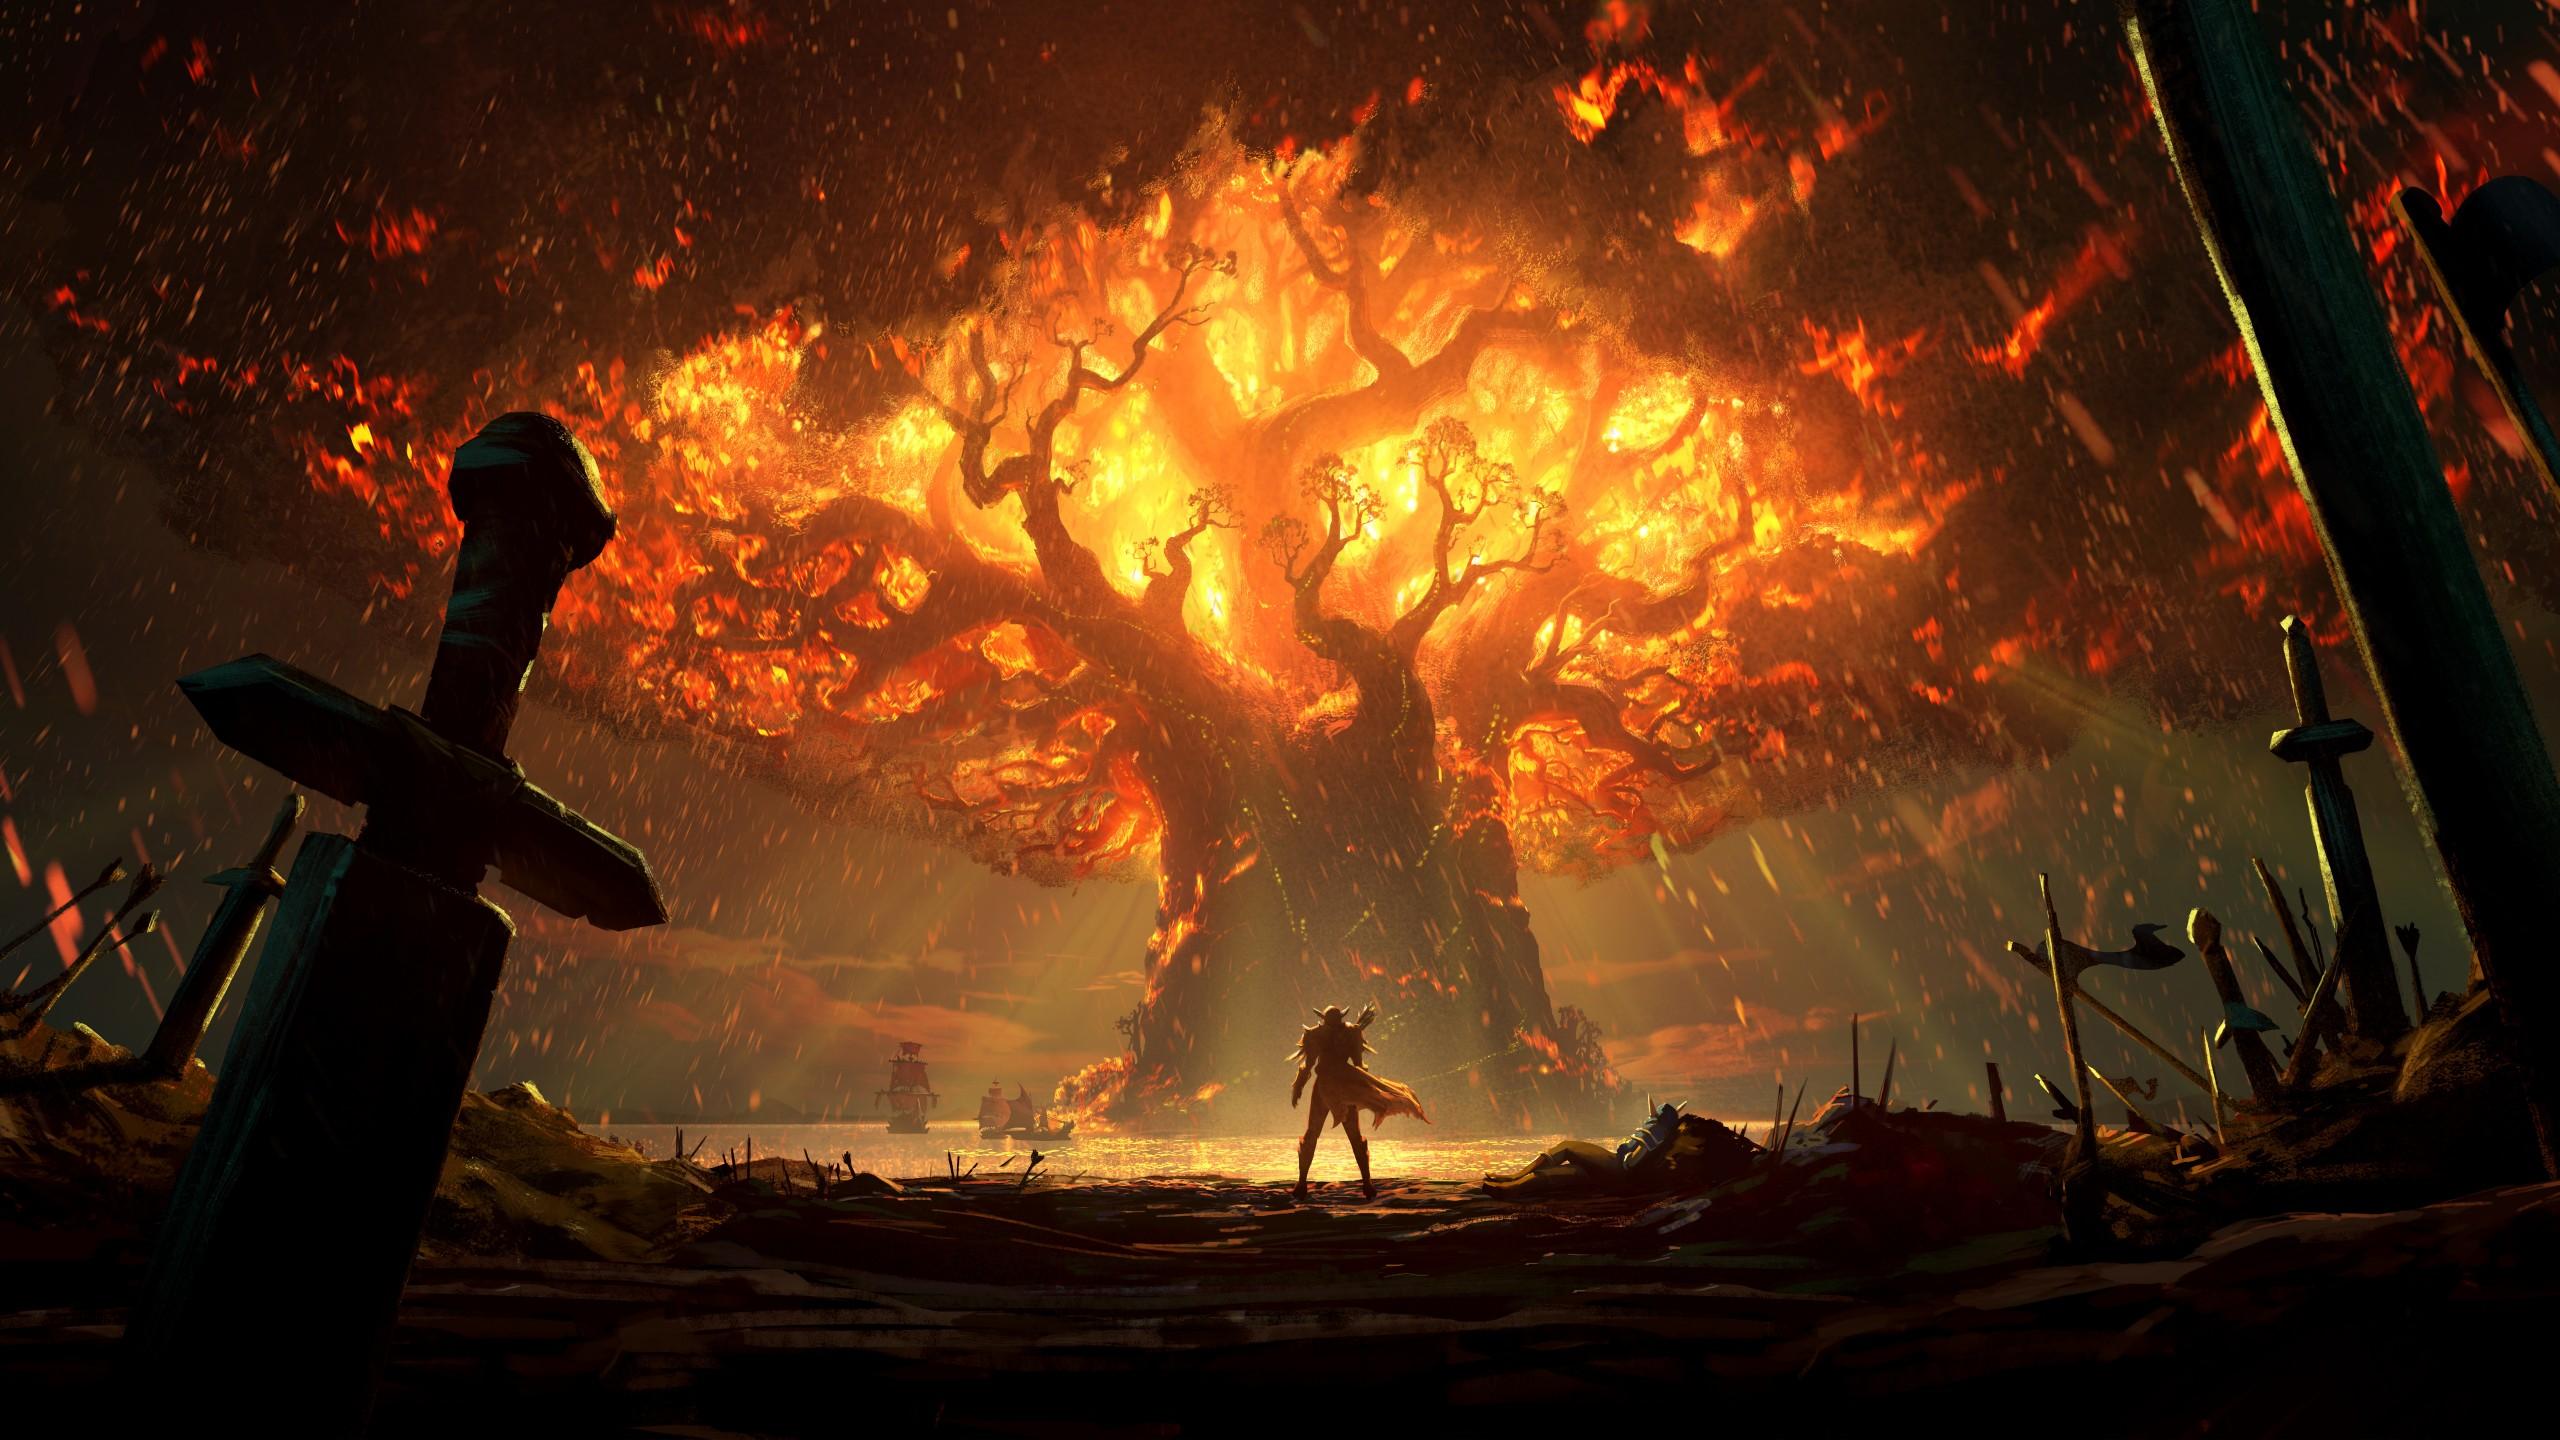 World Of Warcraft Wallpapers Hd World Of Warcraft Battle For Azeroth Key Art 2018 4k 8k